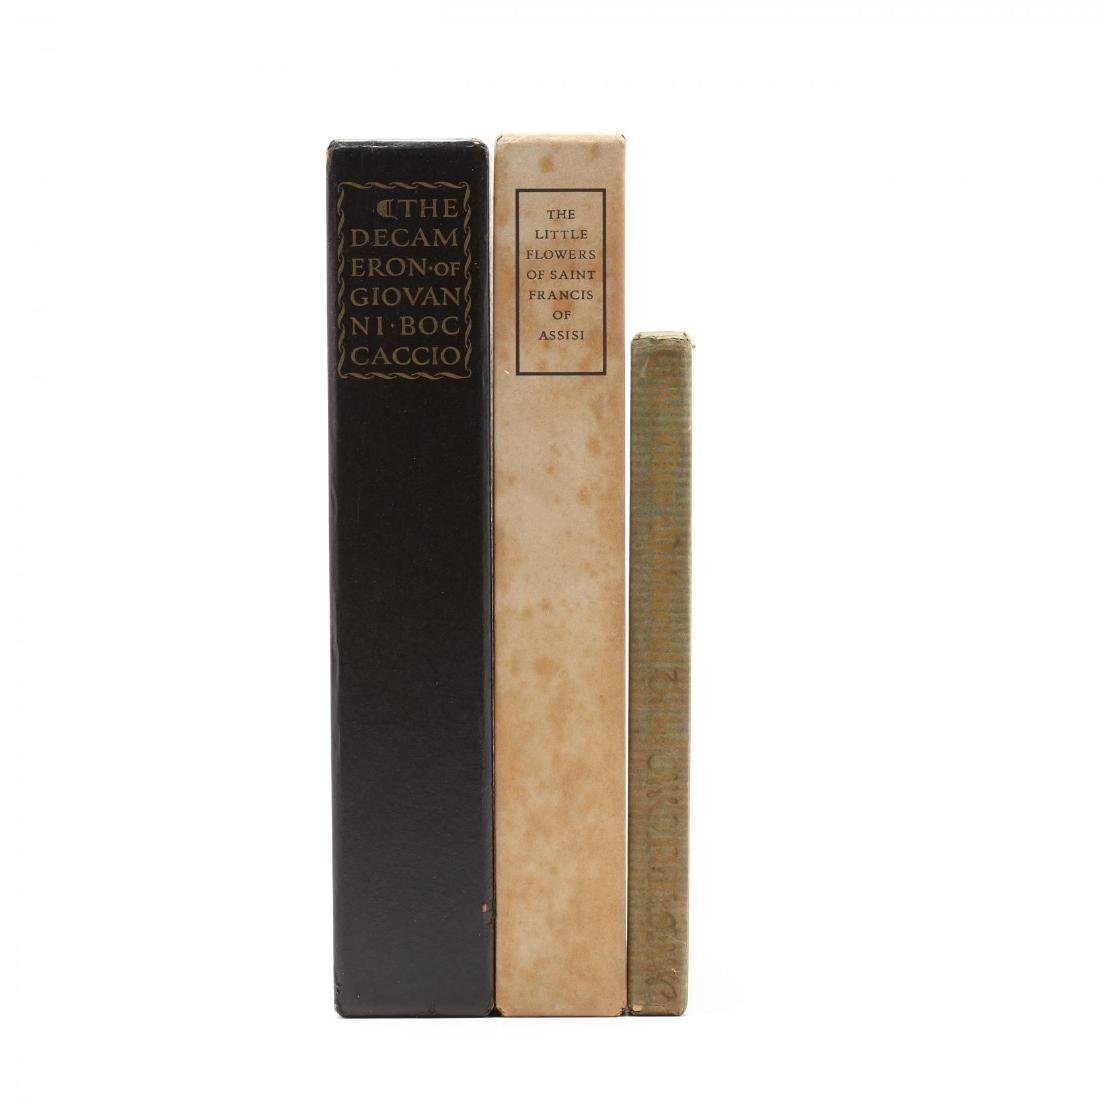 Three Prewar Limited Editions Club Slipcased Books With